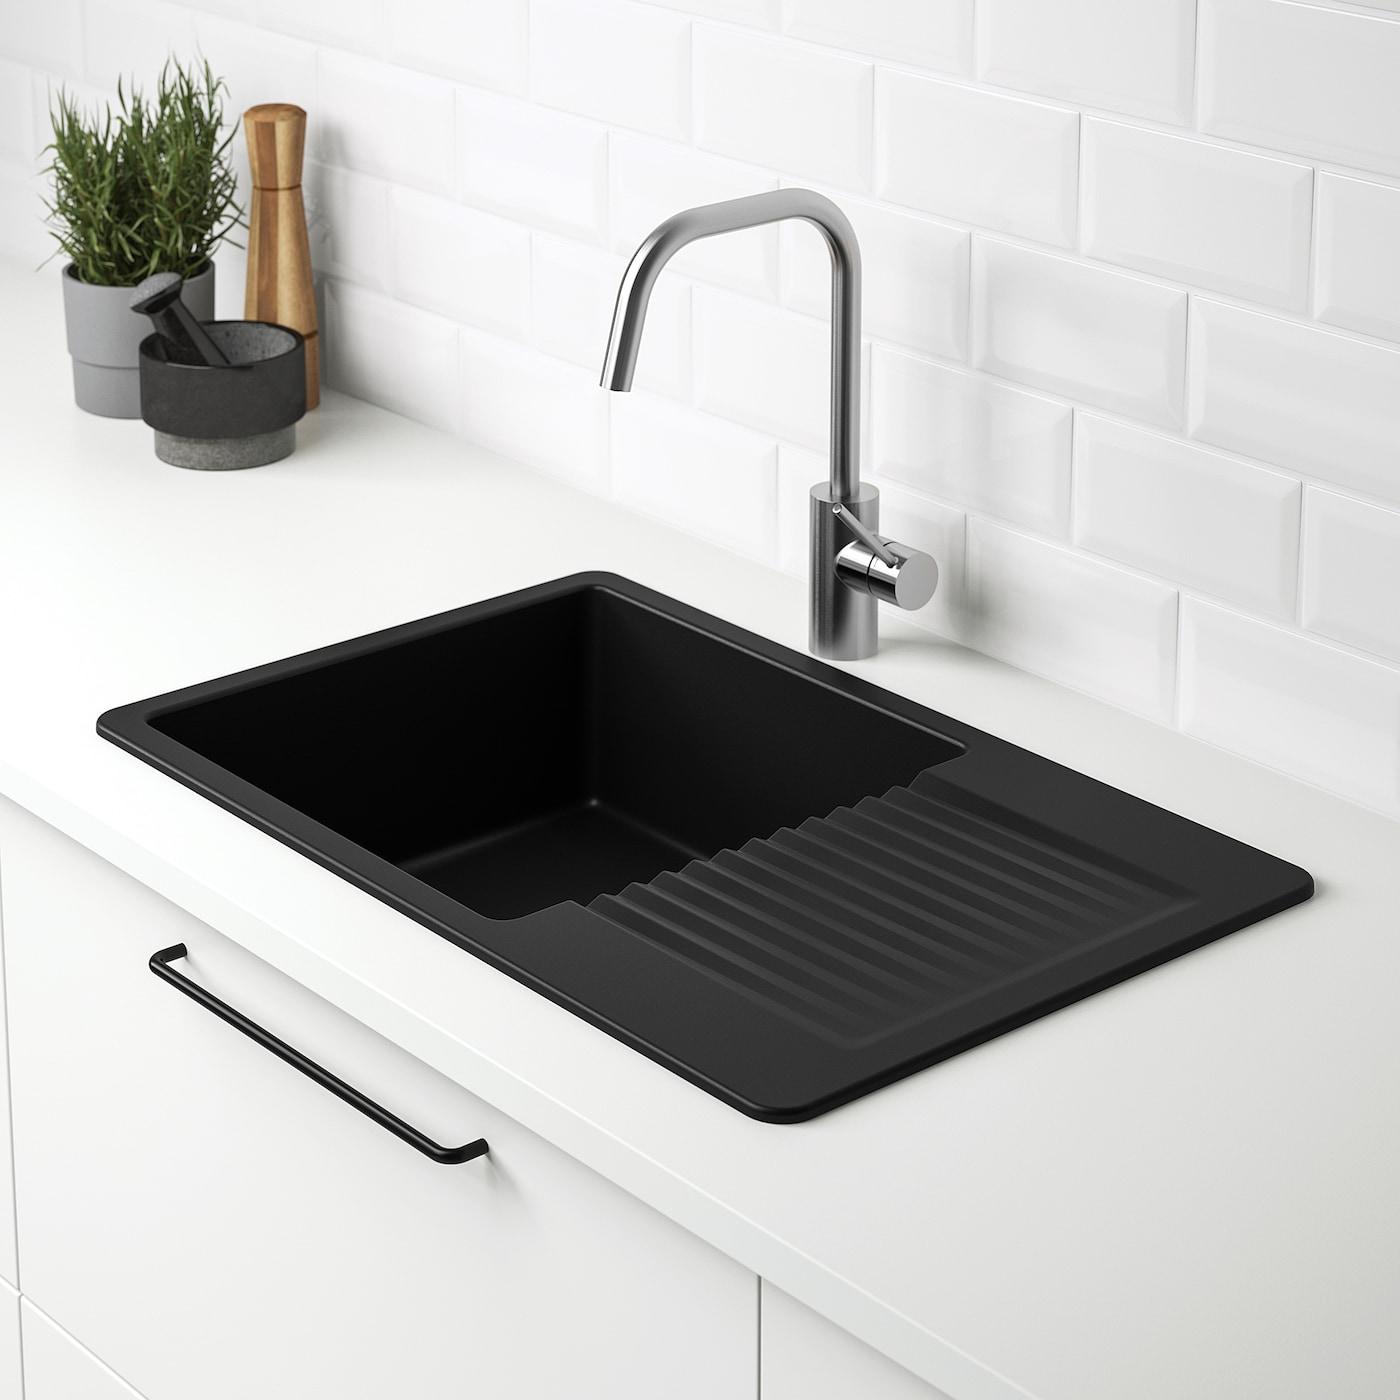 Kilsviken Inset Sink 1 Bowl With Drainboard Black Quartz Composite Ikea Ireland